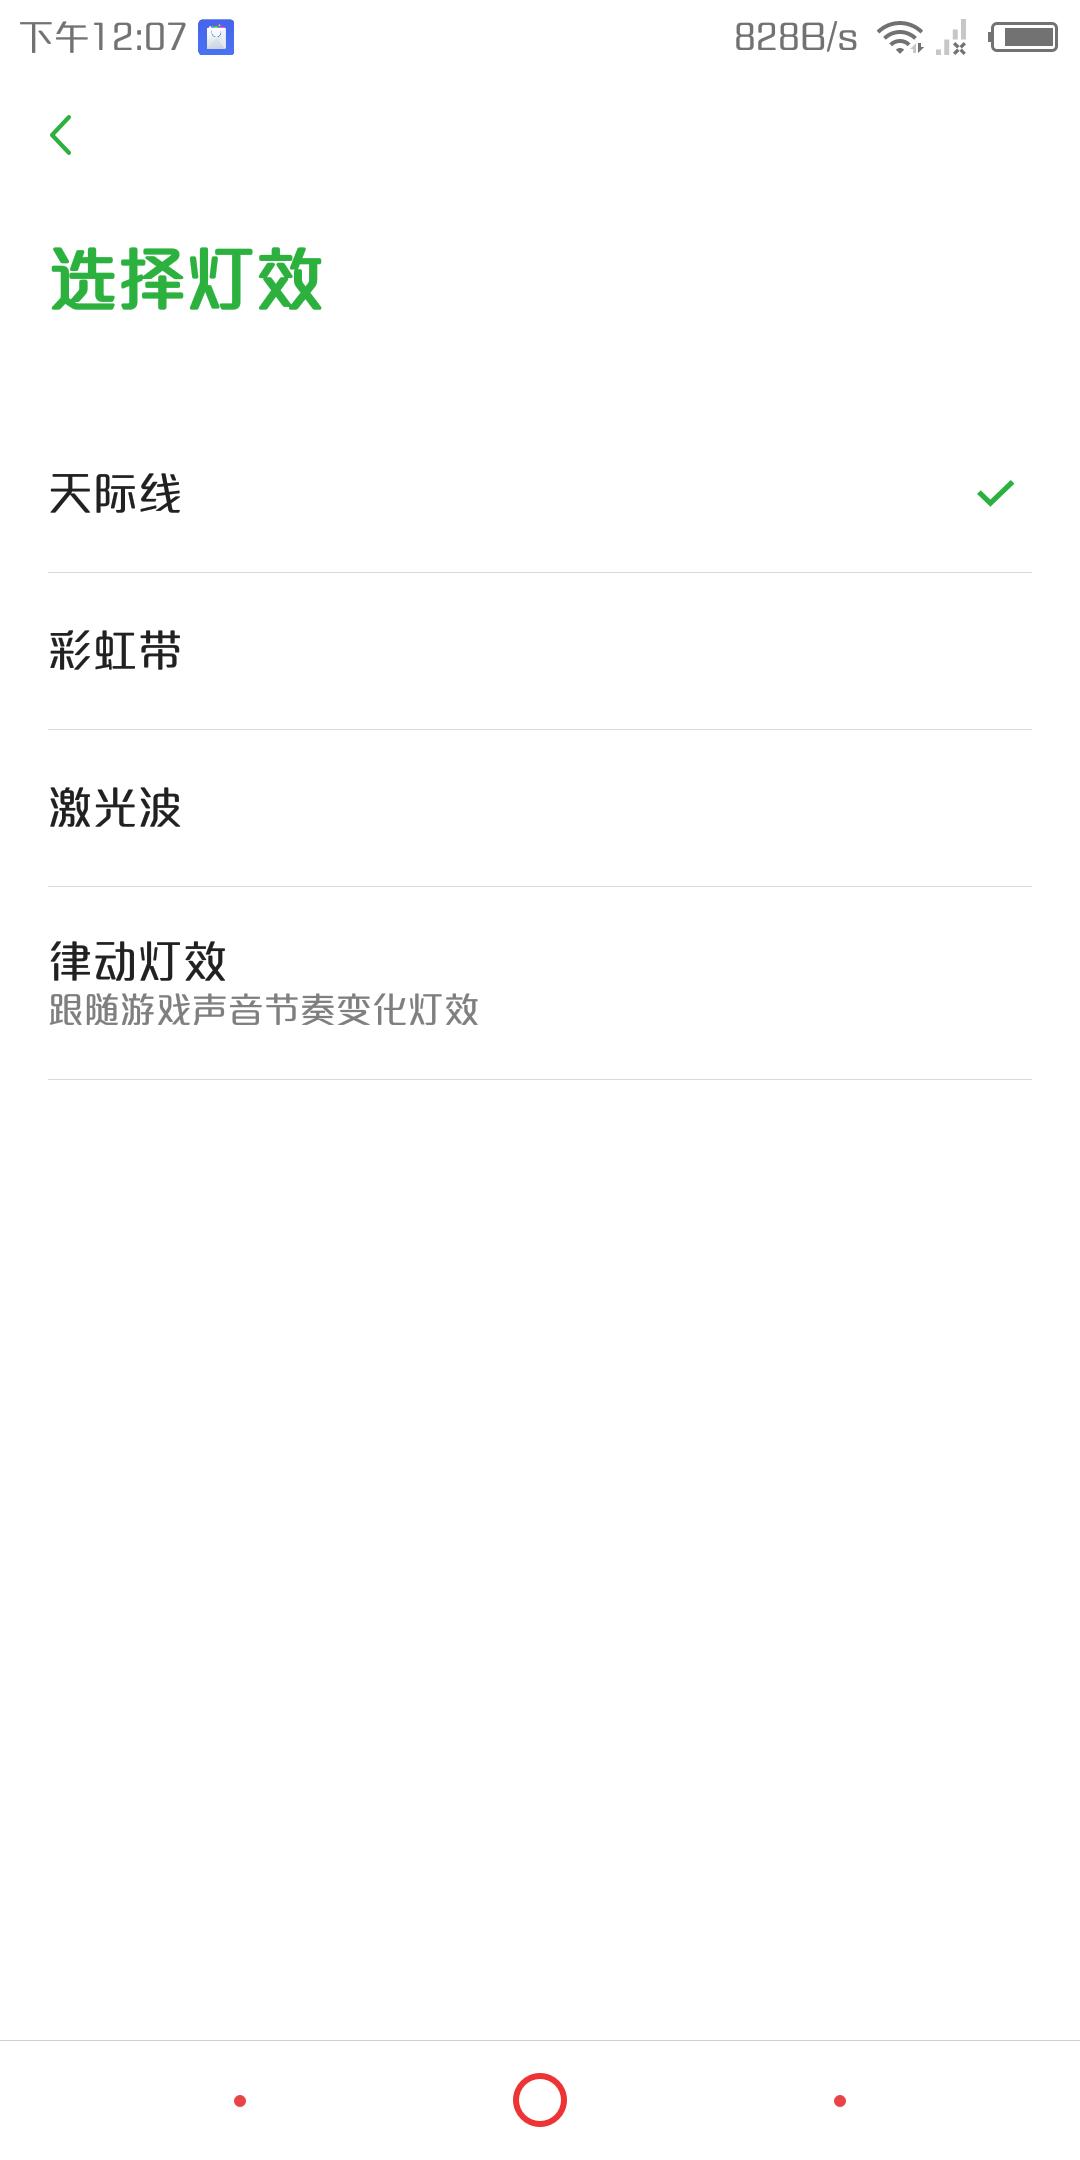 Screenshot_2018-04-27-12-07-43.png